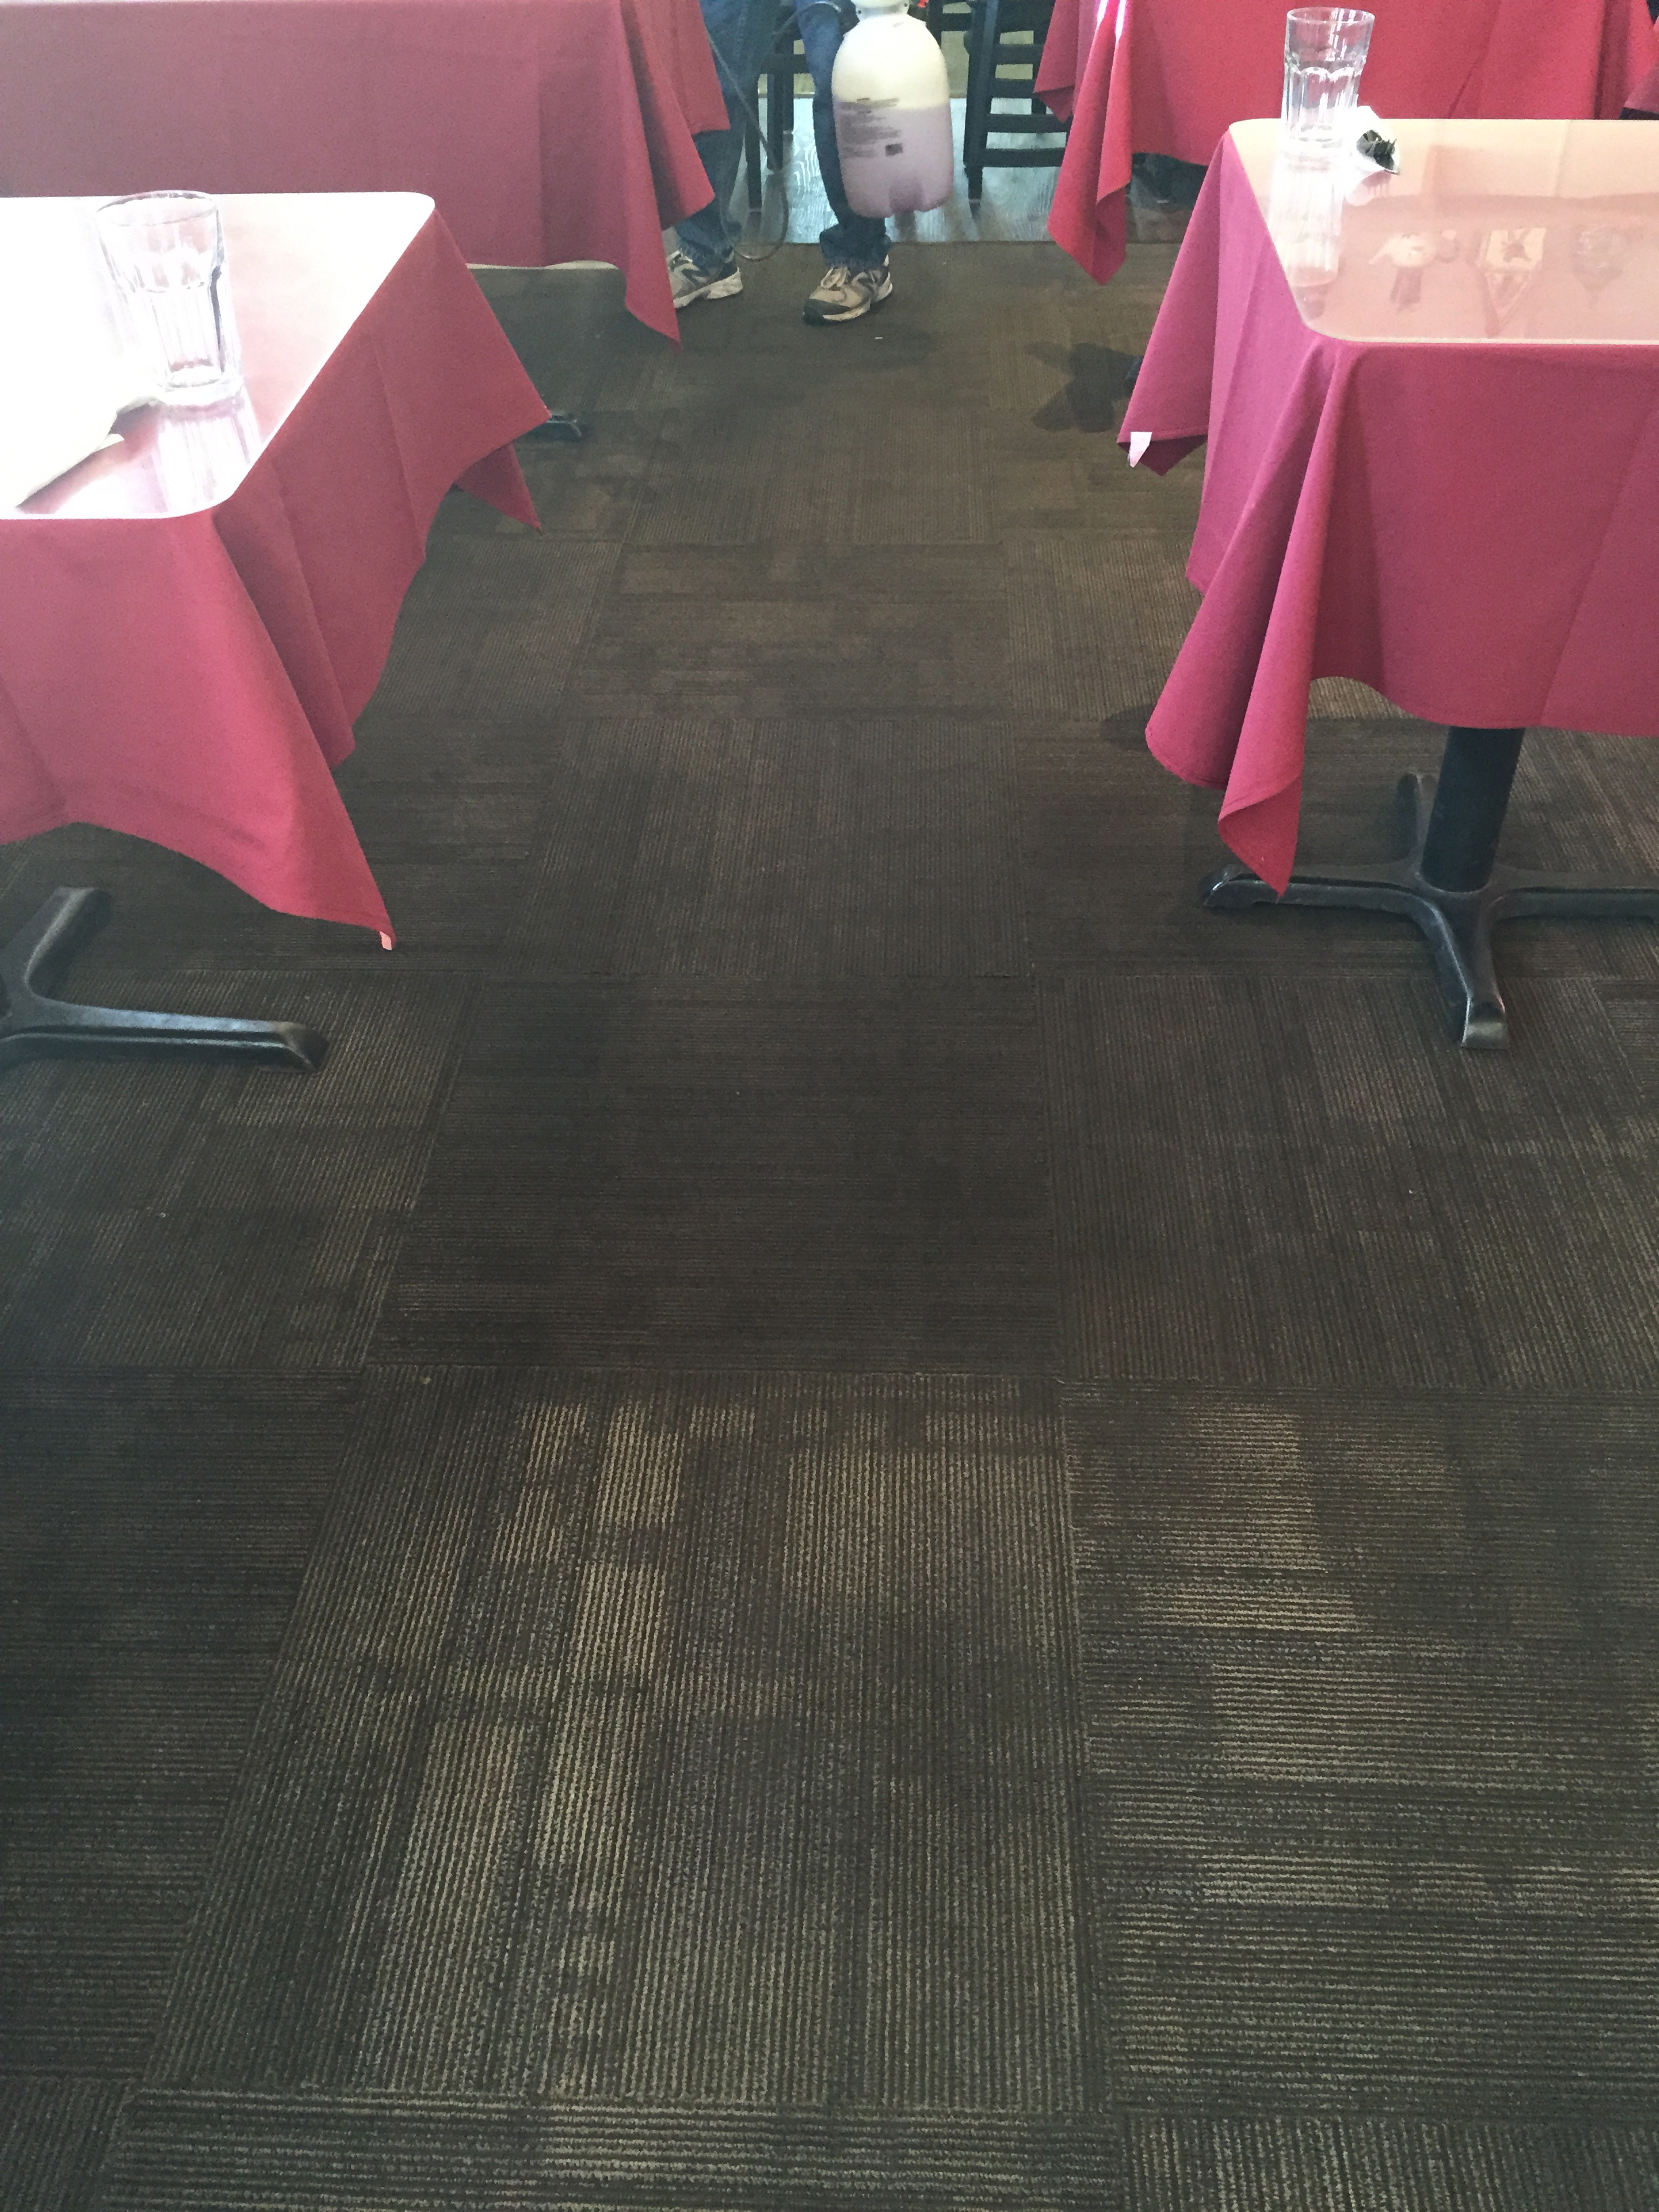 Carpet cleaning Fairbanks